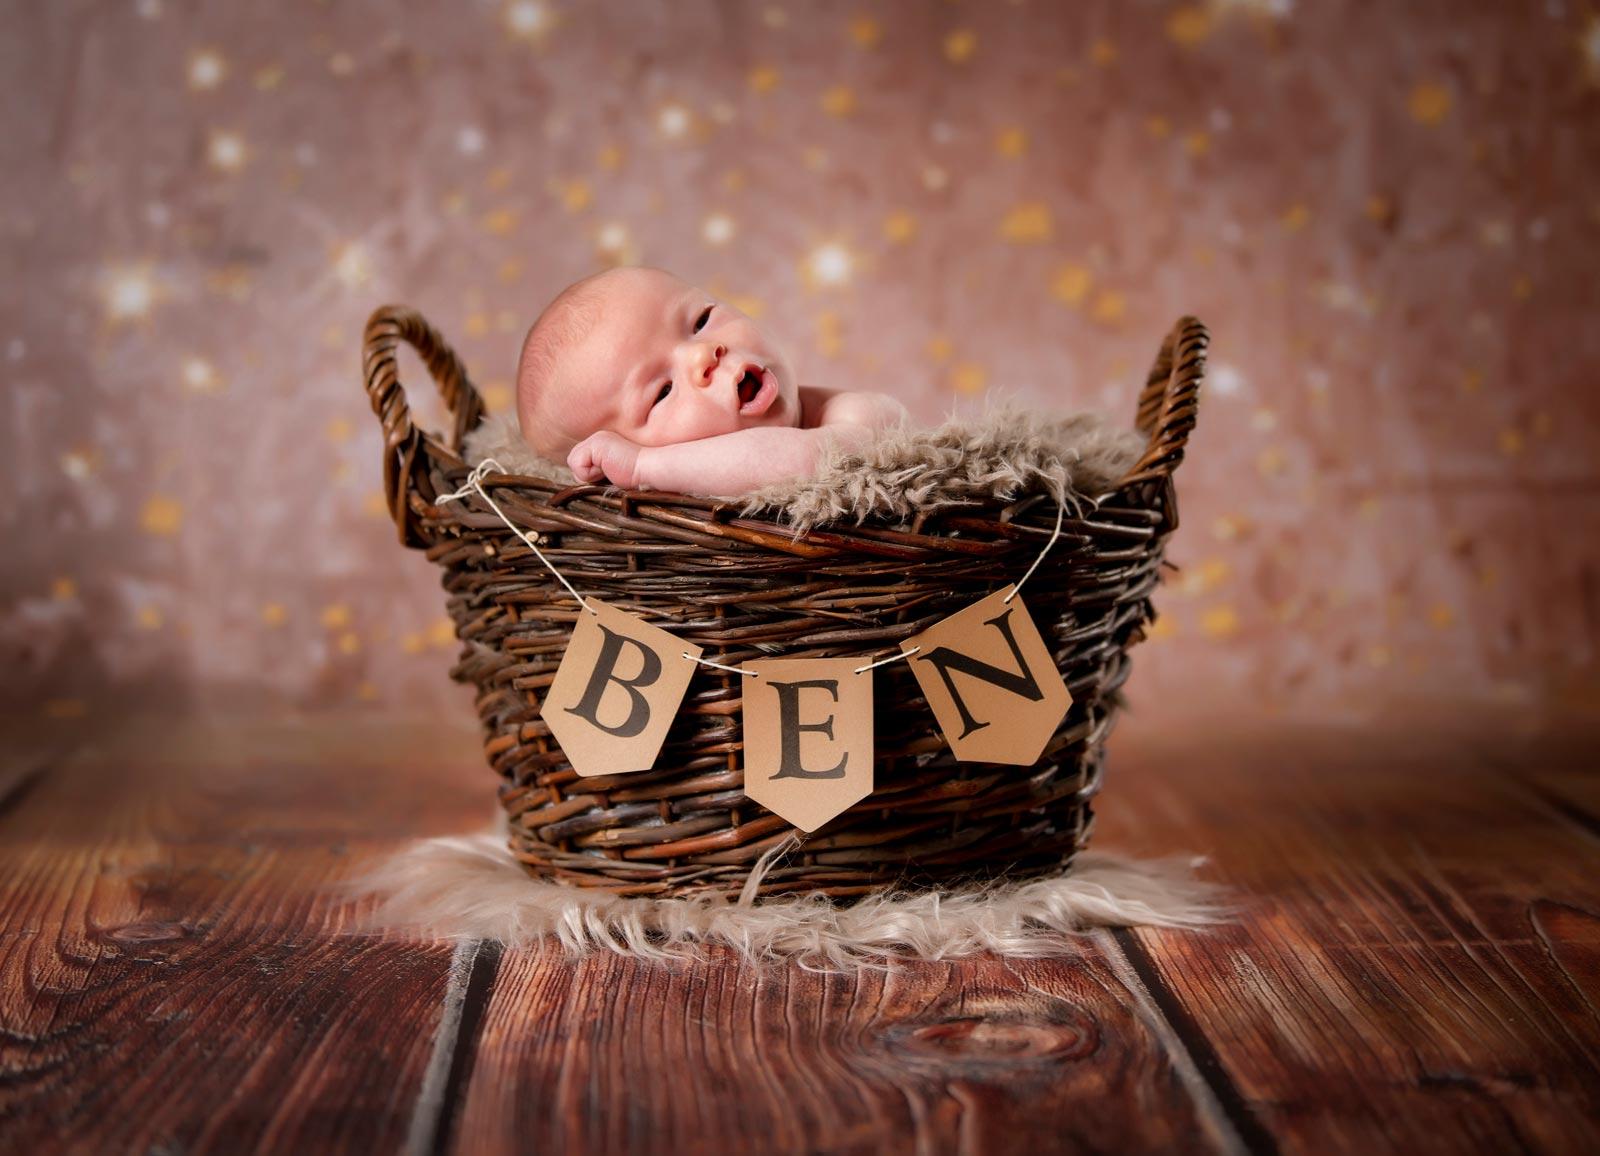 newbornfotoshooting fotoatelier statt krankenhaus marburg